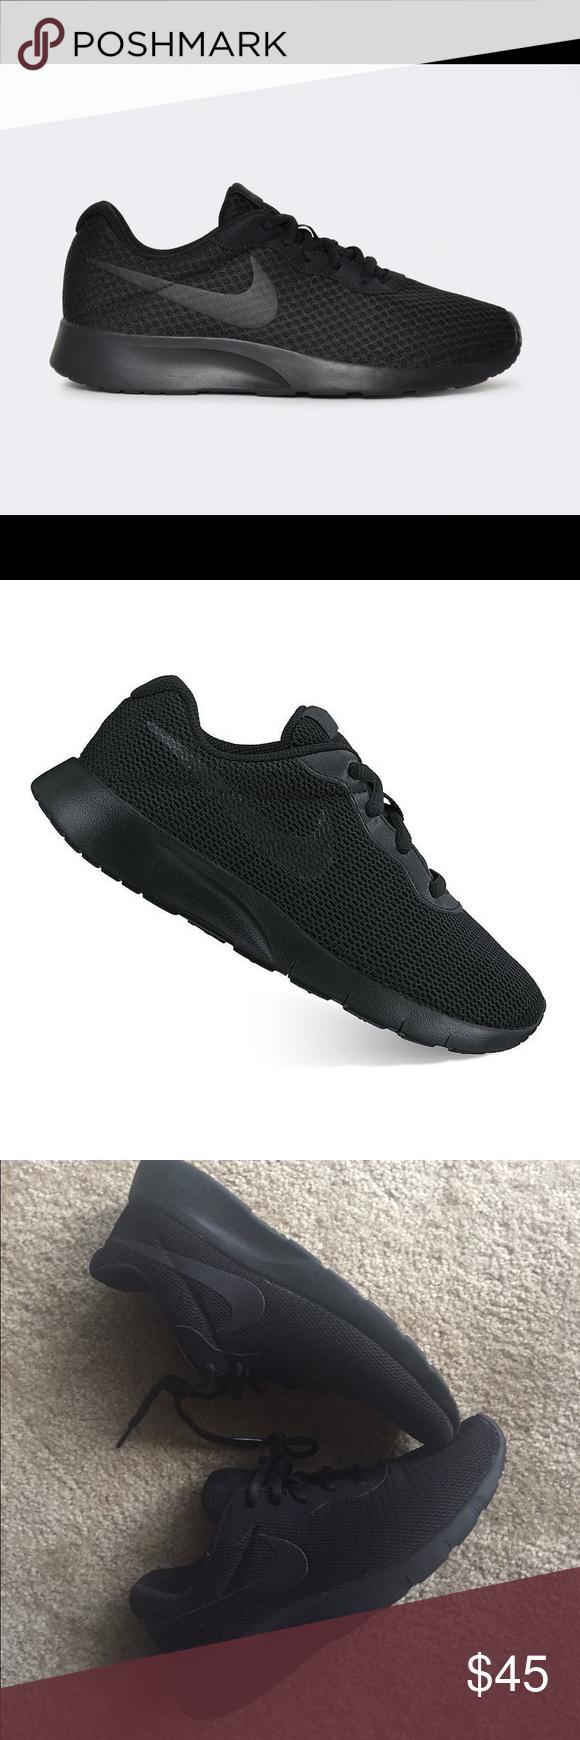 Dato relé Tiranía  All black Nike Tanjun | All black nikes, Black nikes, Nike tanjun